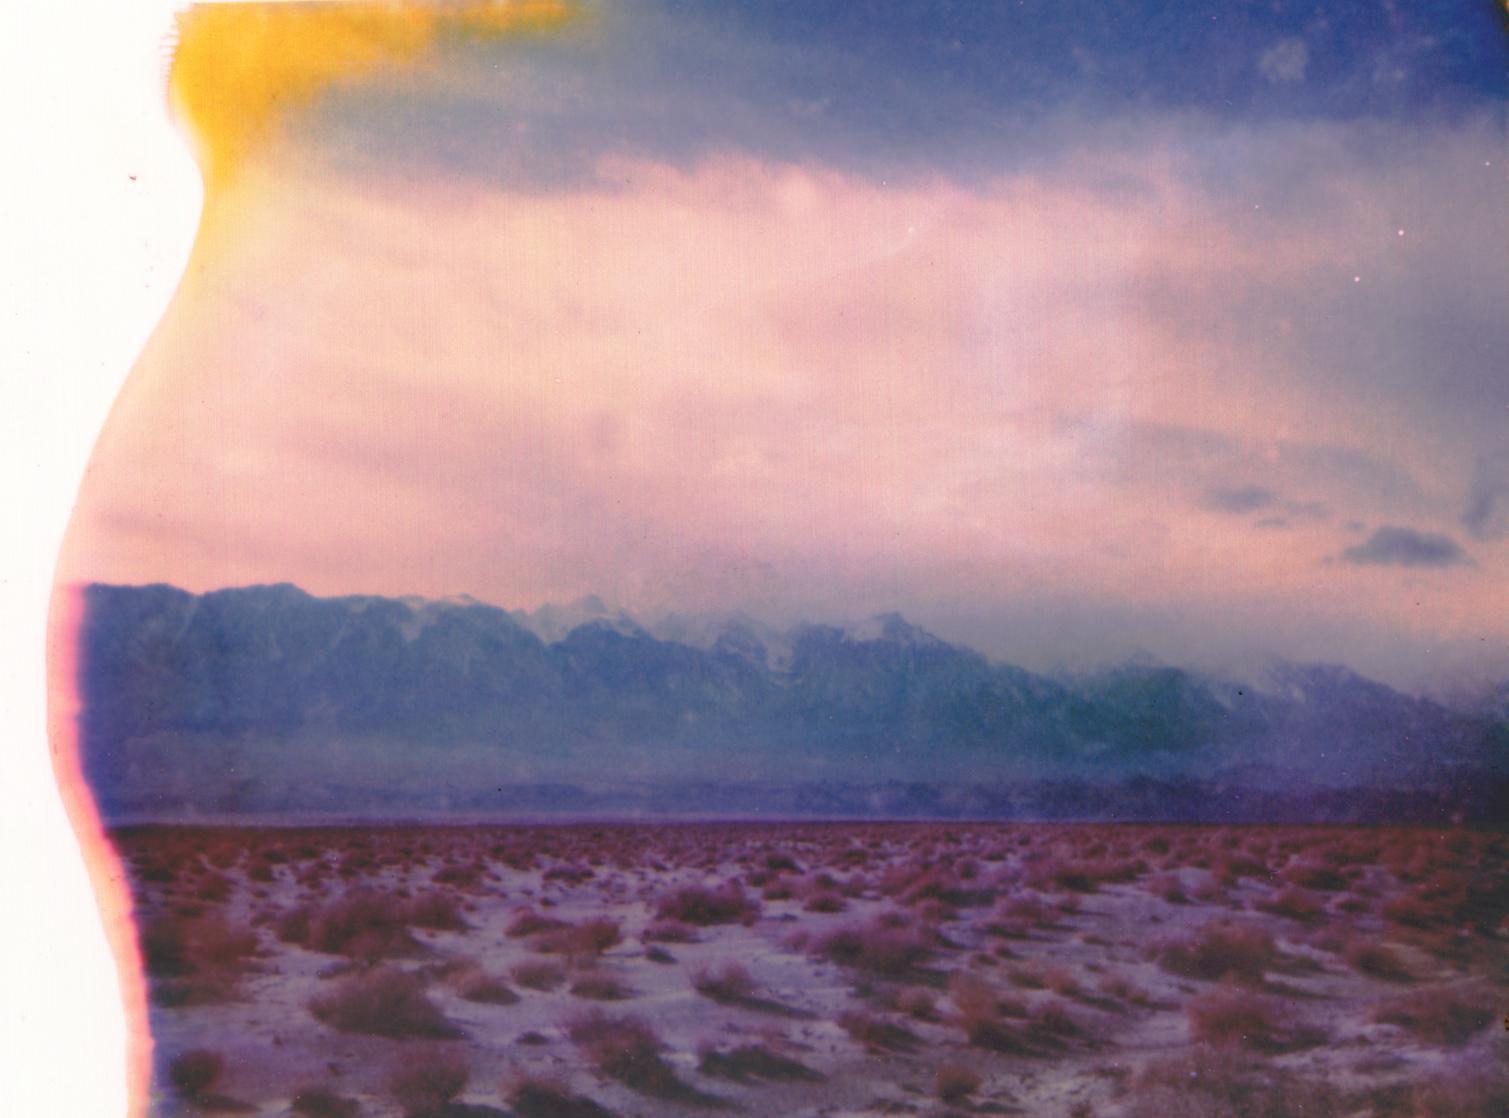 Wallpaper : sky, mountains, clouds, landscape, Polaroid